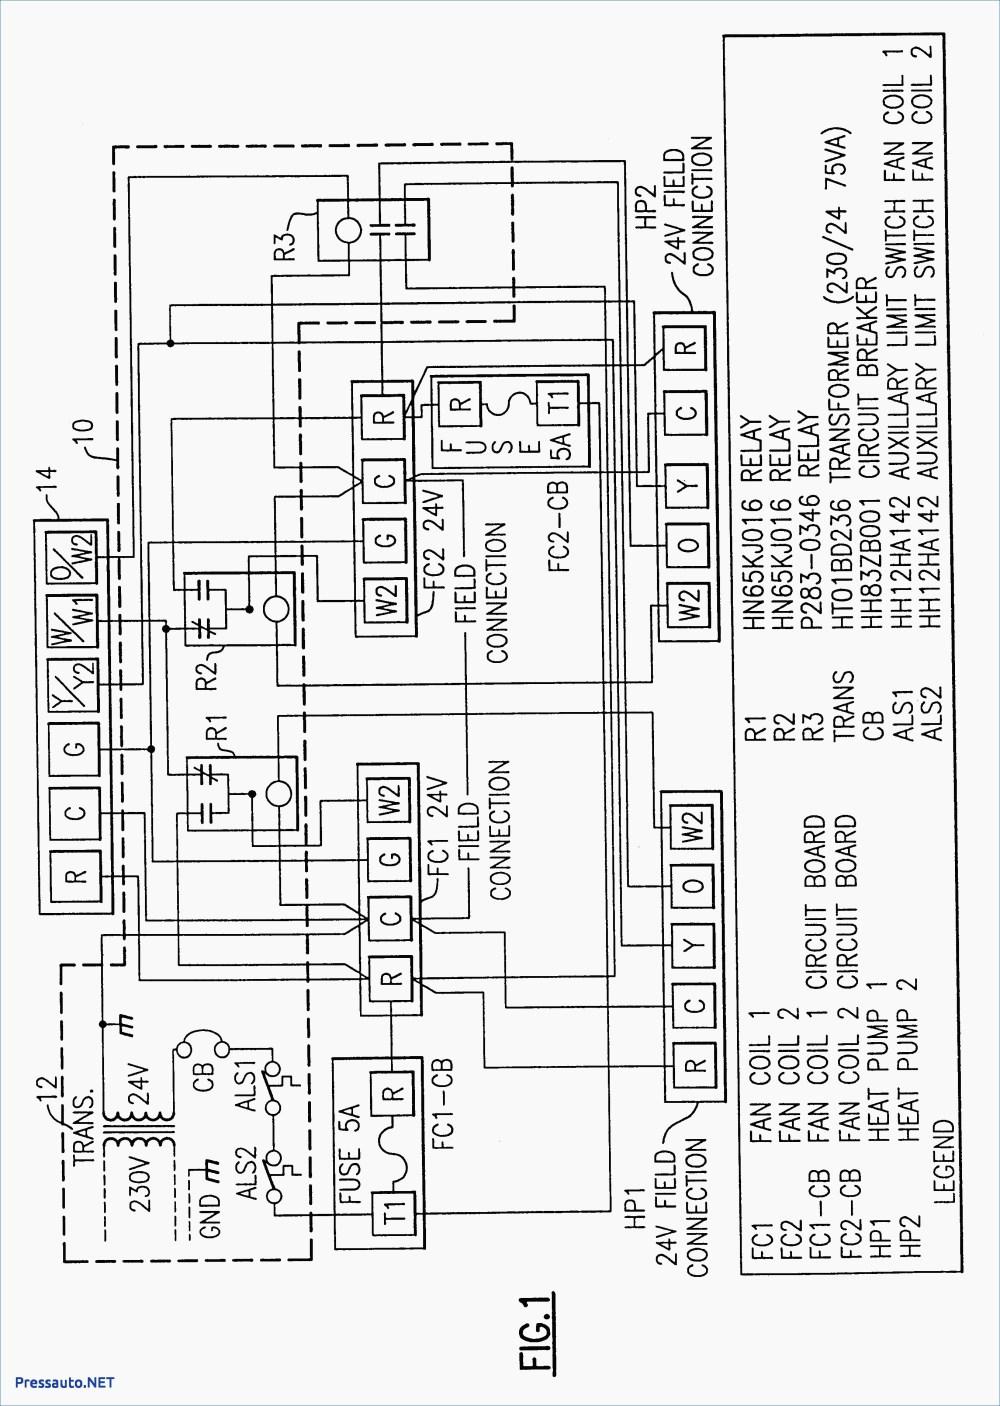 medium resolution of honeywell fan limit switch wiring diagram collection honeywell fan limit switch wiring diagram fresh honeywell